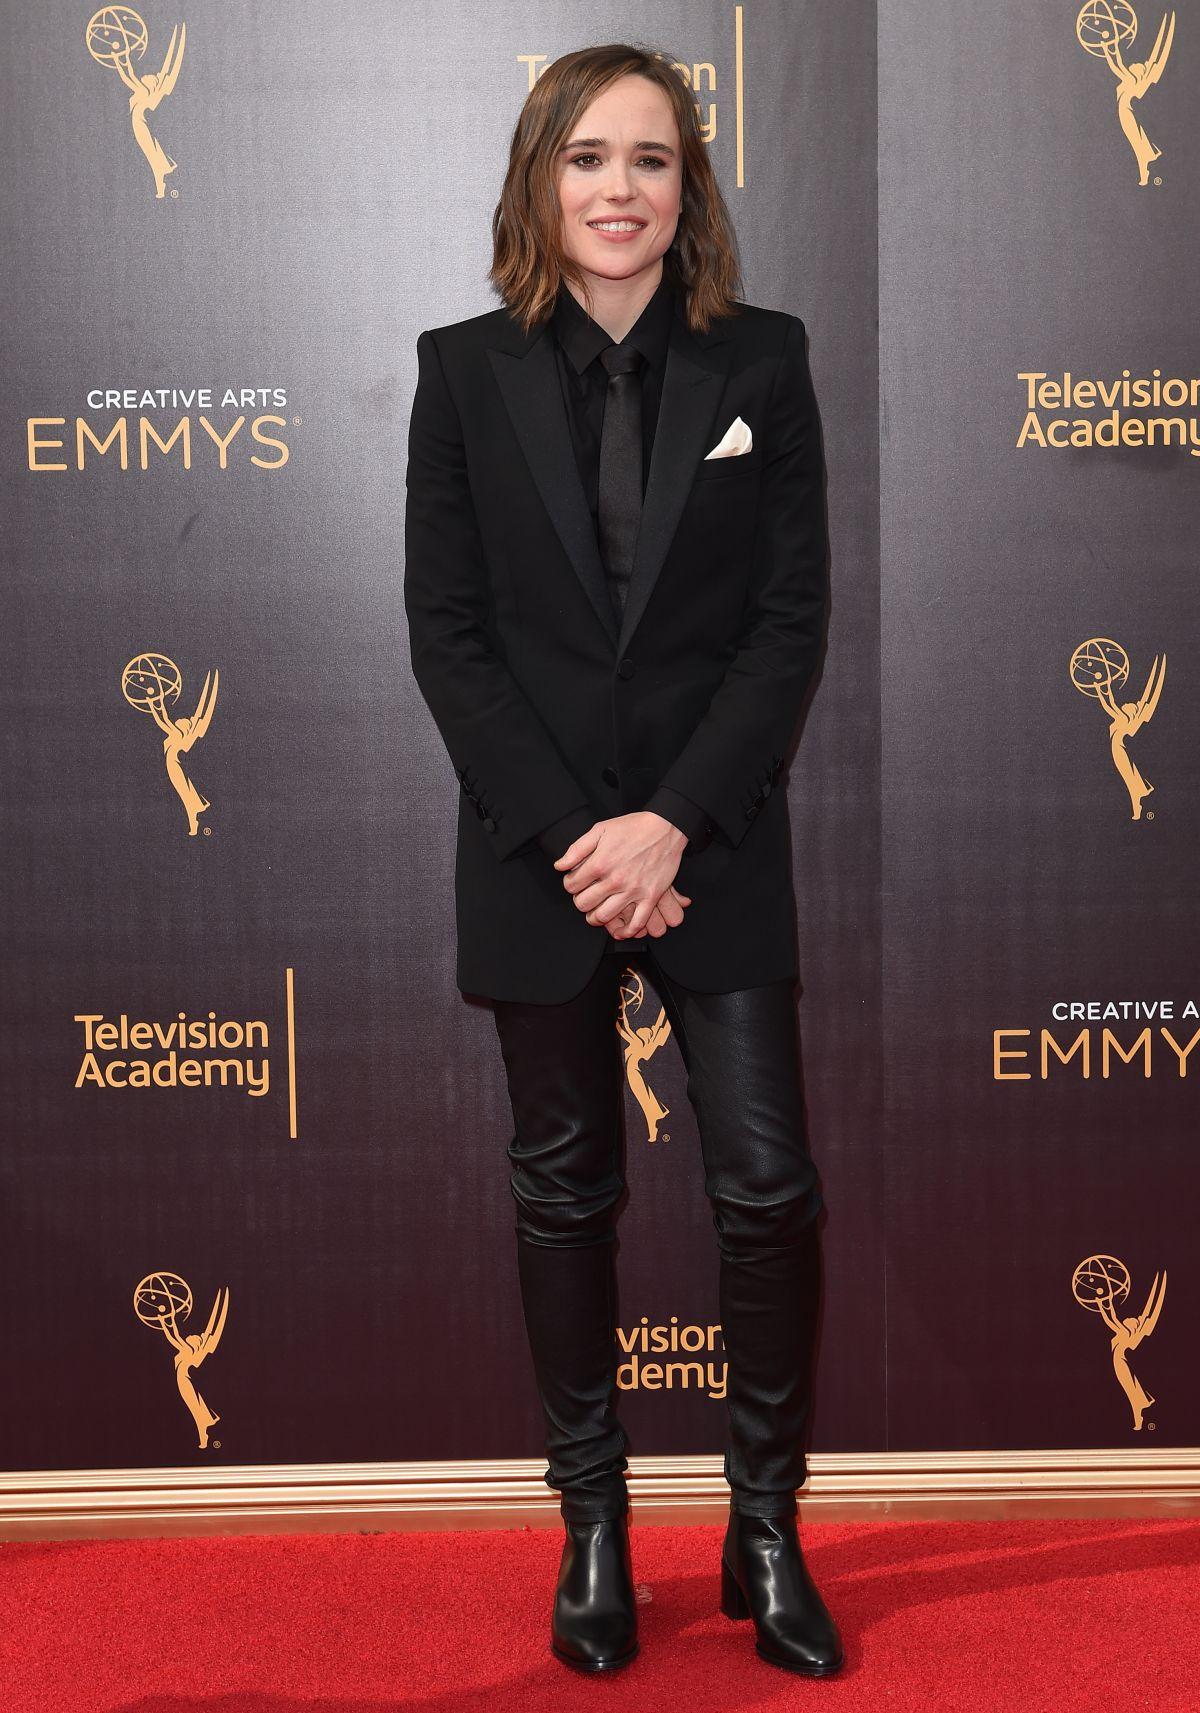 ELLEN PAGE at 2016 Creative Arts Emmy Awards in Los Angeles 09/11/2016